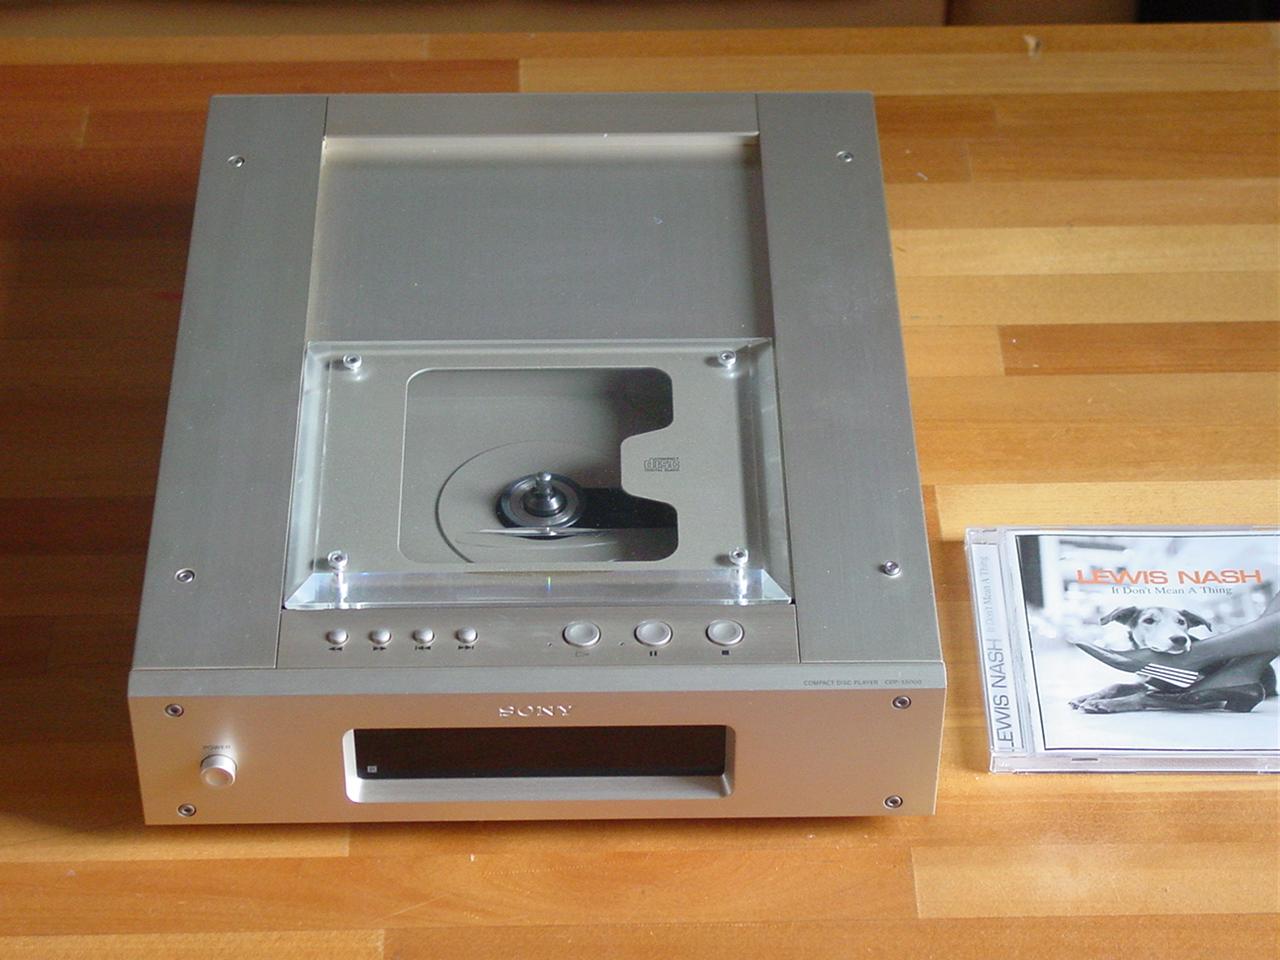 Lectores de cd de carga superior 7ce0327c